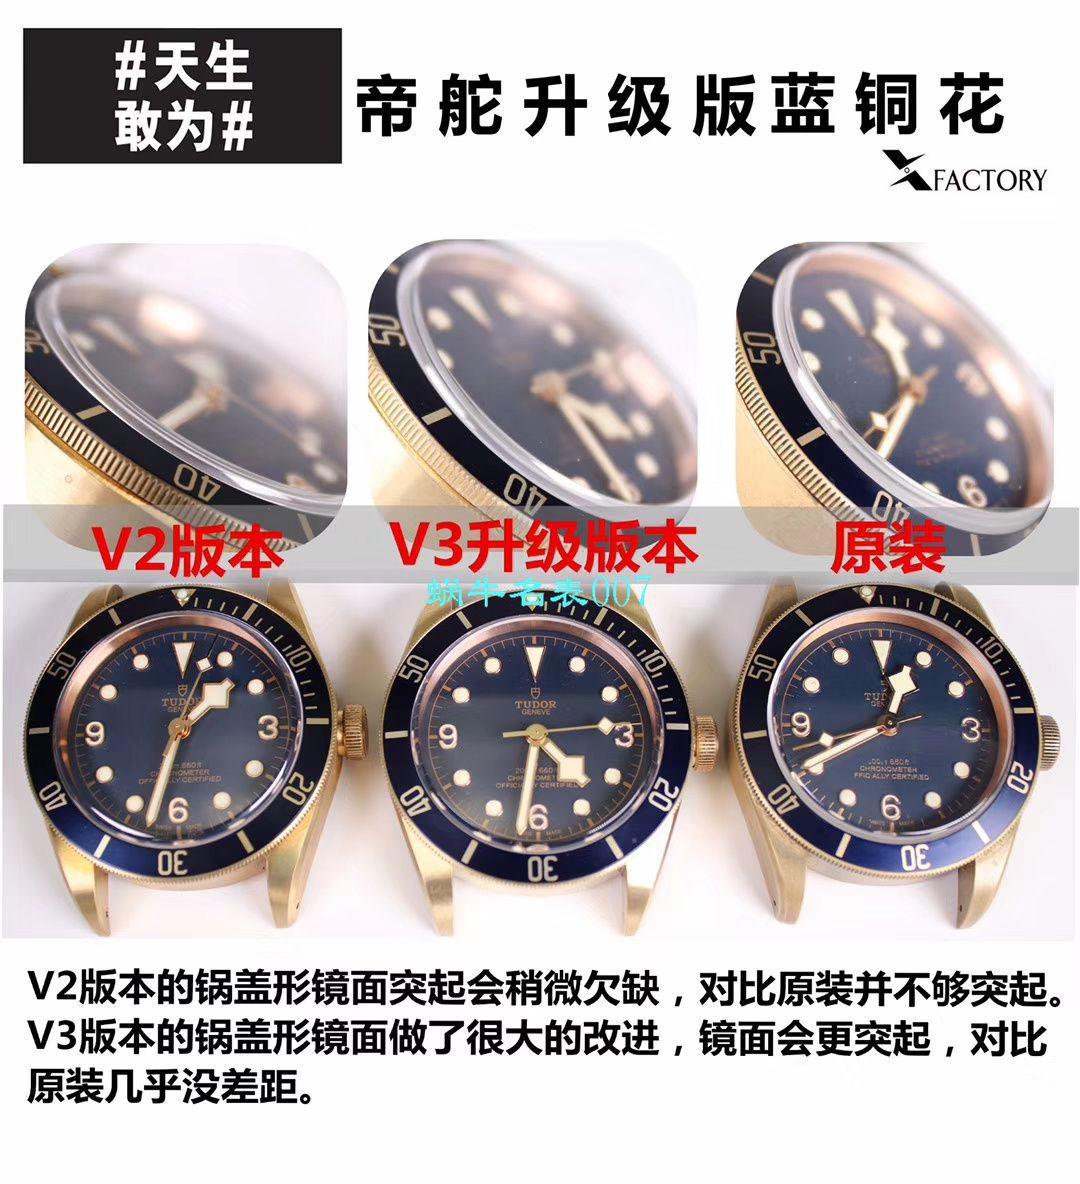 【XF厂V3版本Tudor铜花升级版复刻表】帝舵碧湾系列M79250BM-0005腕表 / DT061